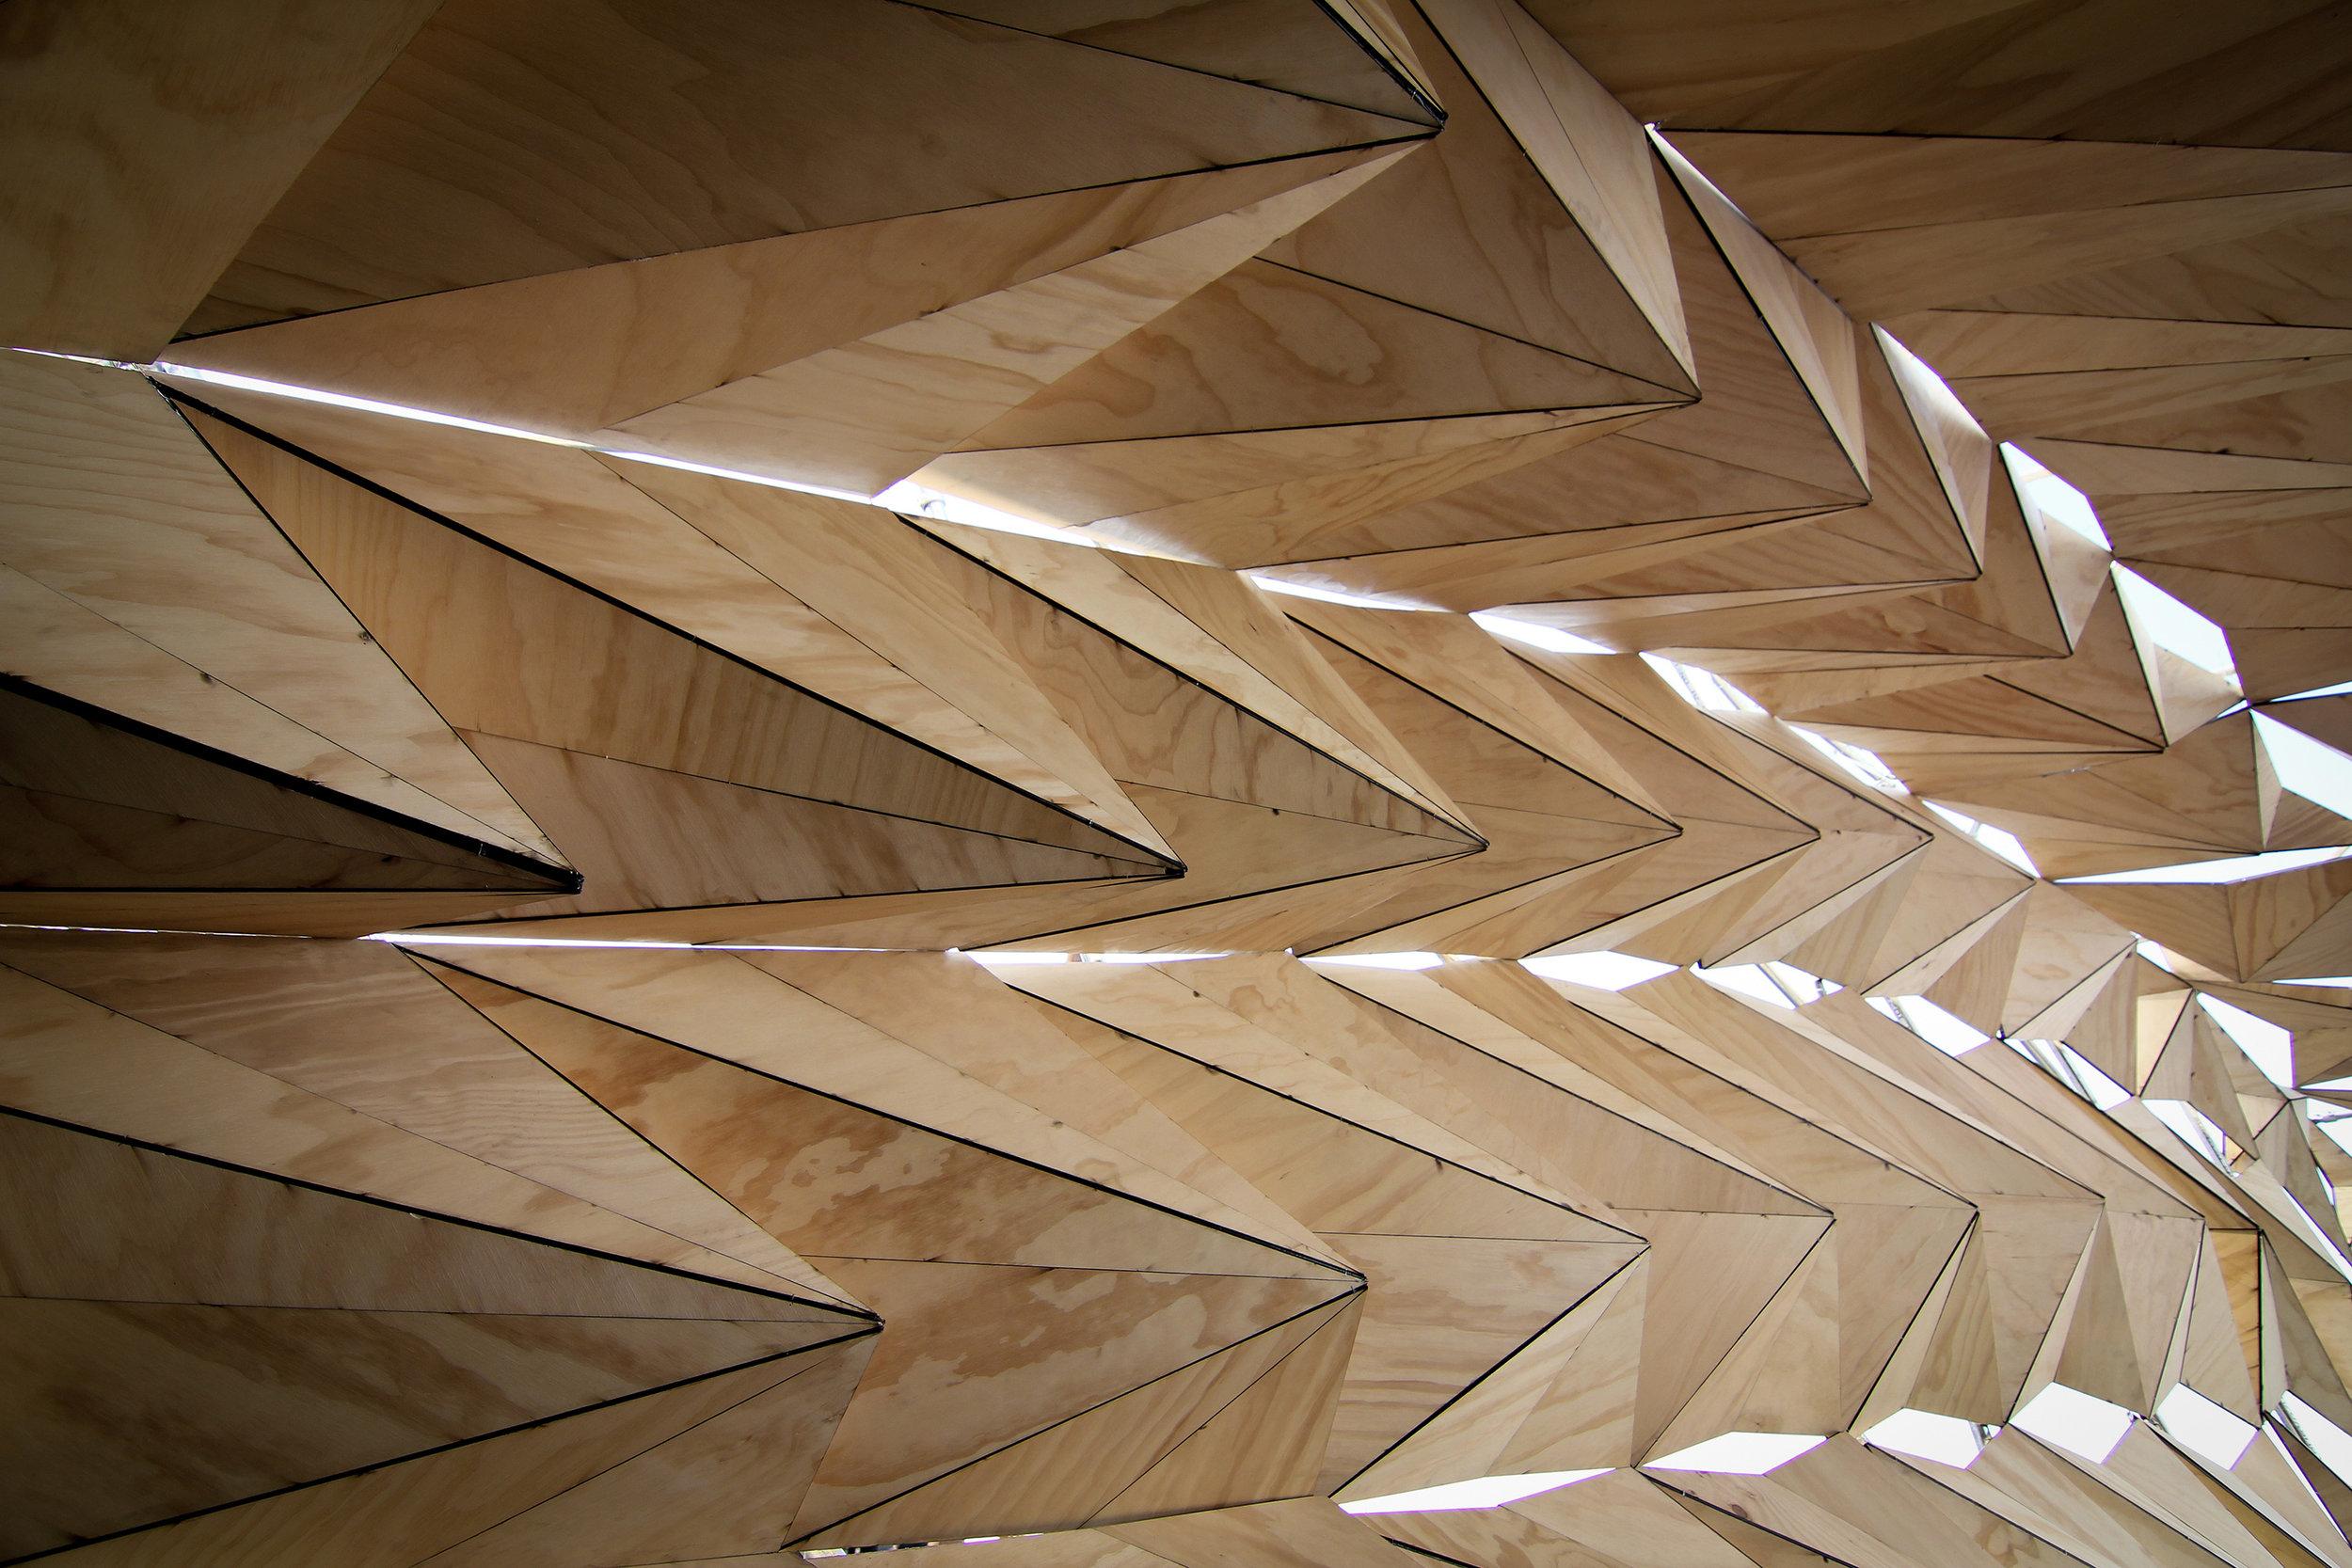 AcousticPavilion-I-2.jpg